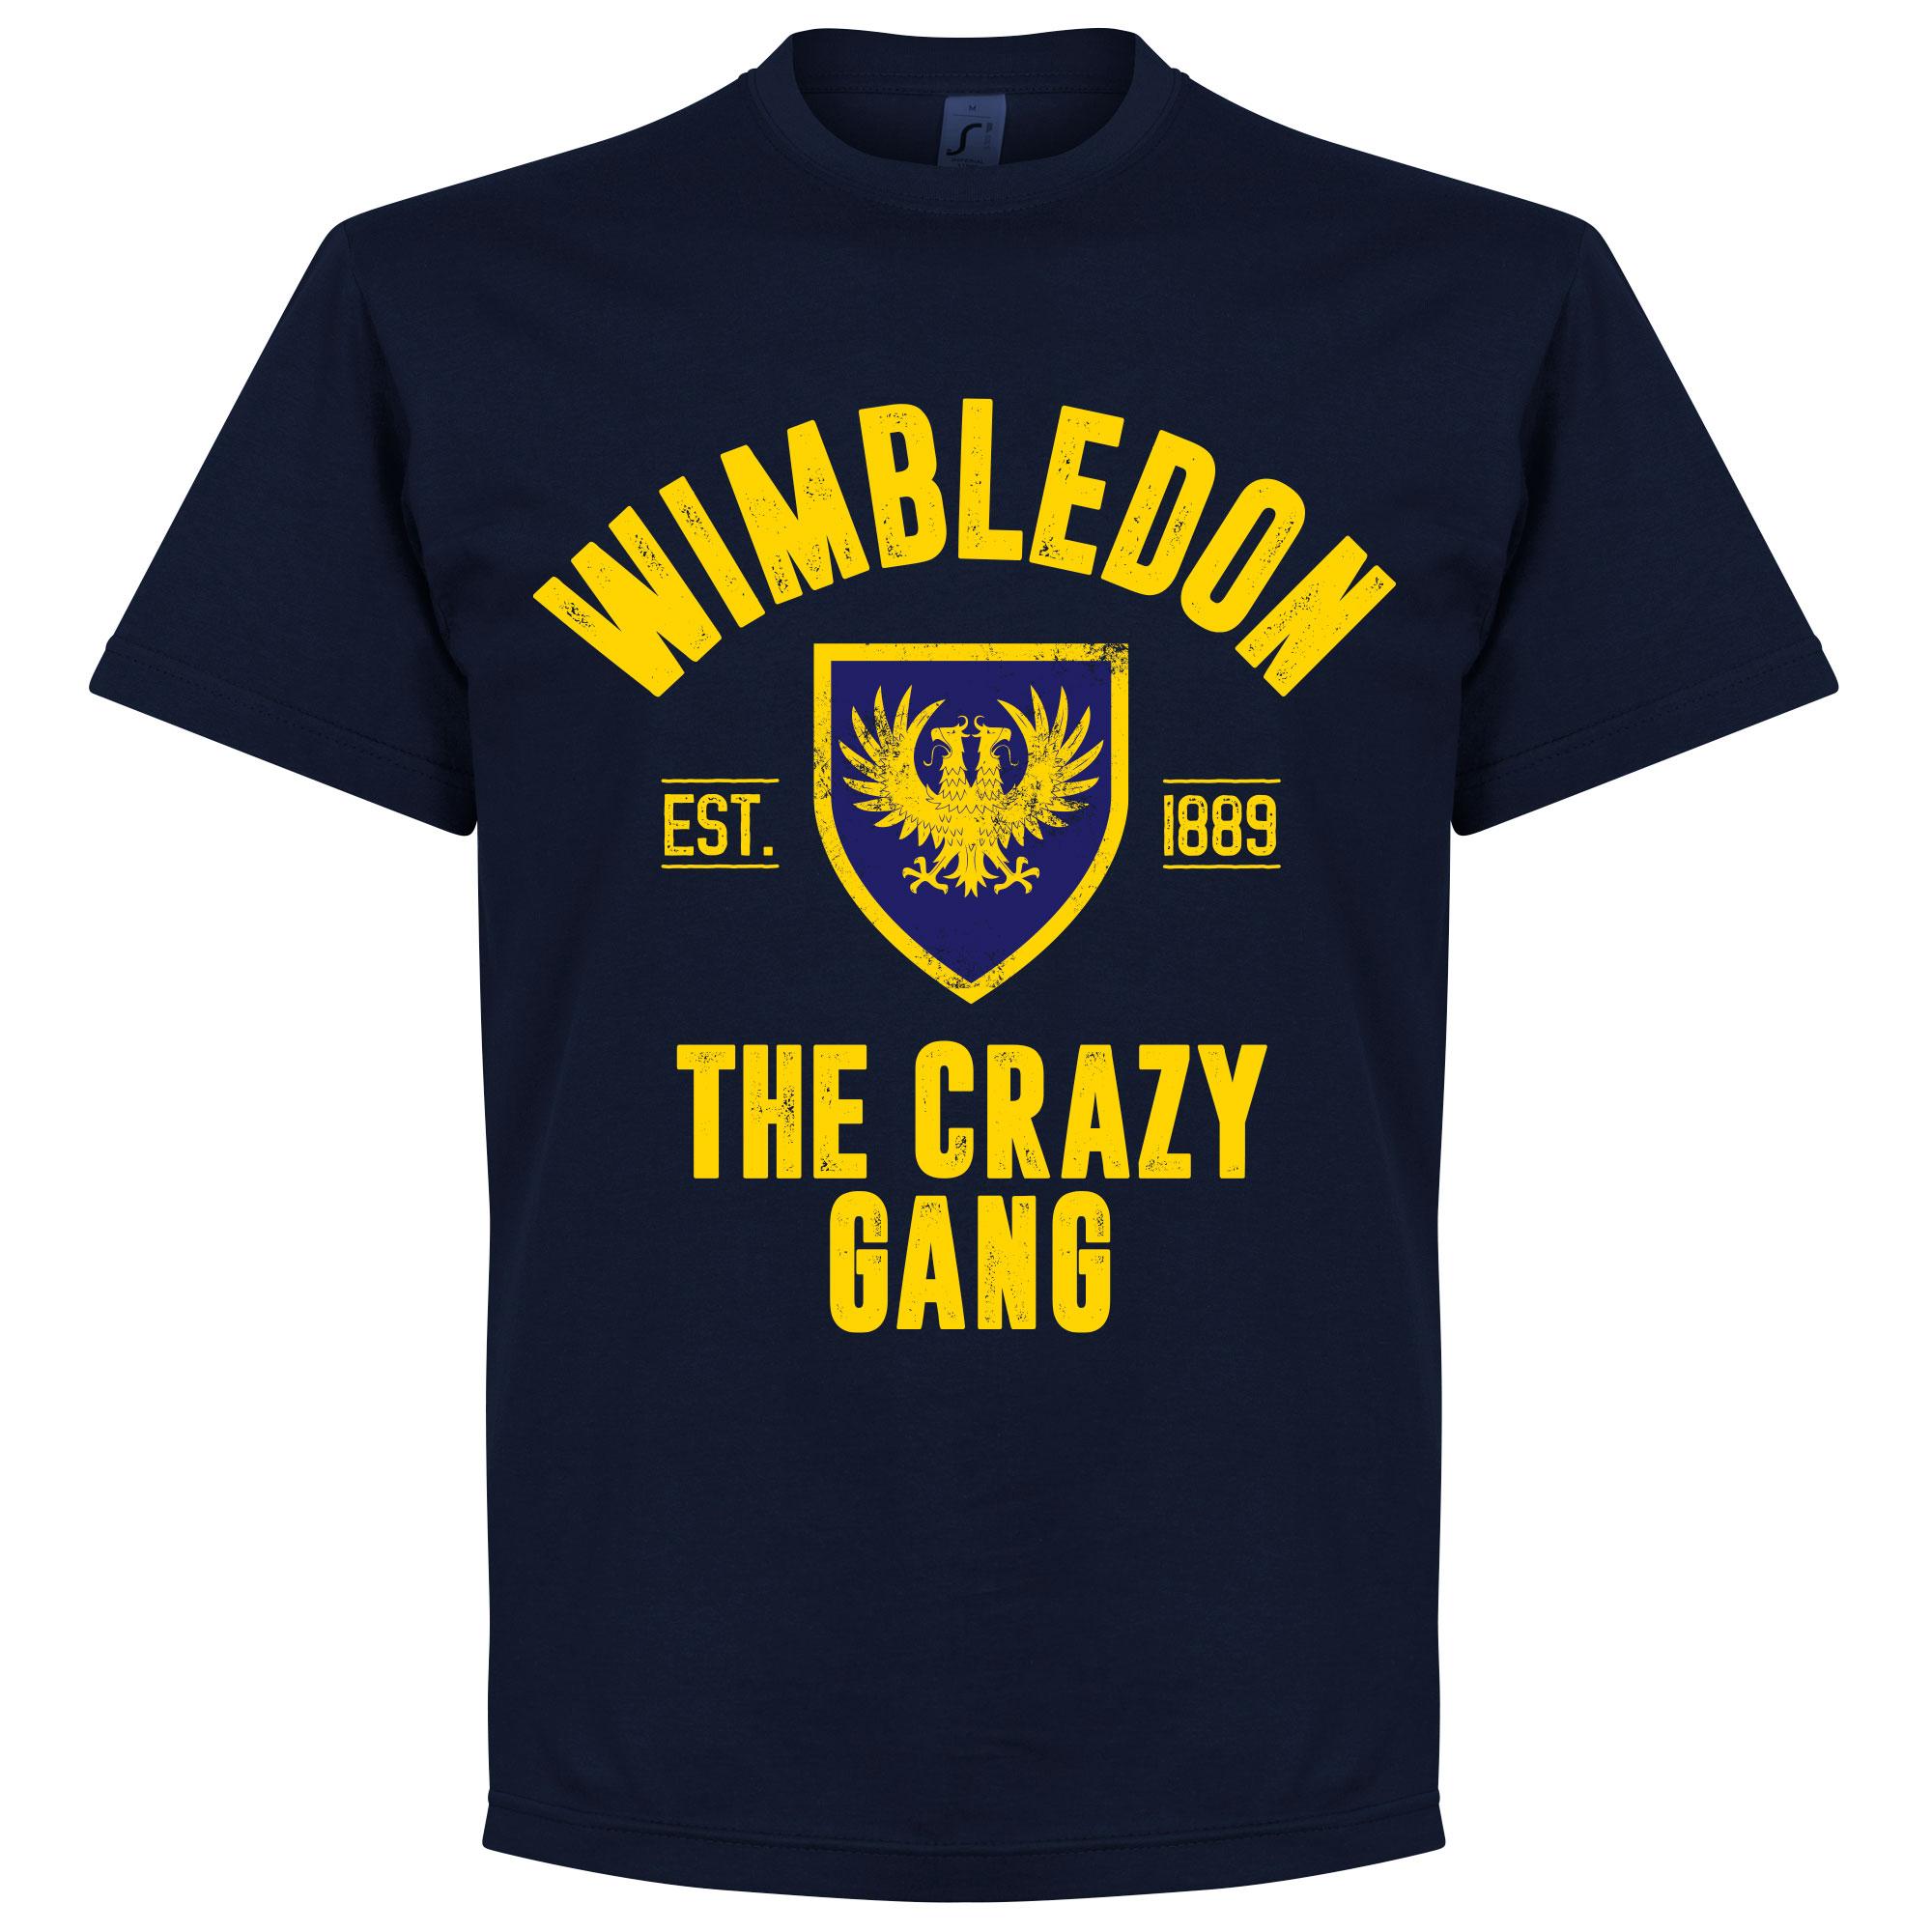 Wimbledon Established T-Shirt - Navy